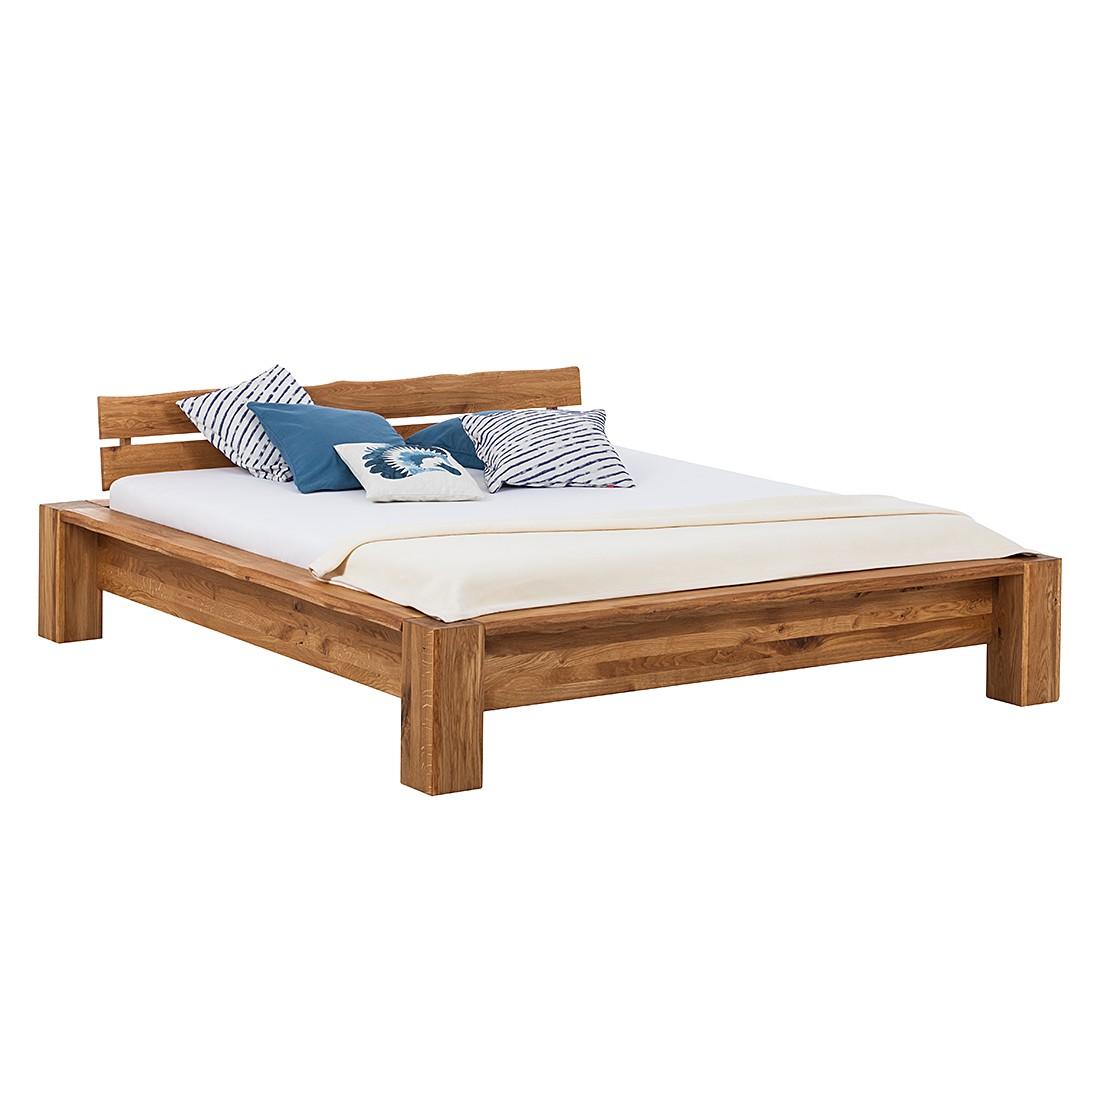 goedkoop Massief houten bed MaeWOOD geolied massief eikenhout 180 x 200cm Ars Natura